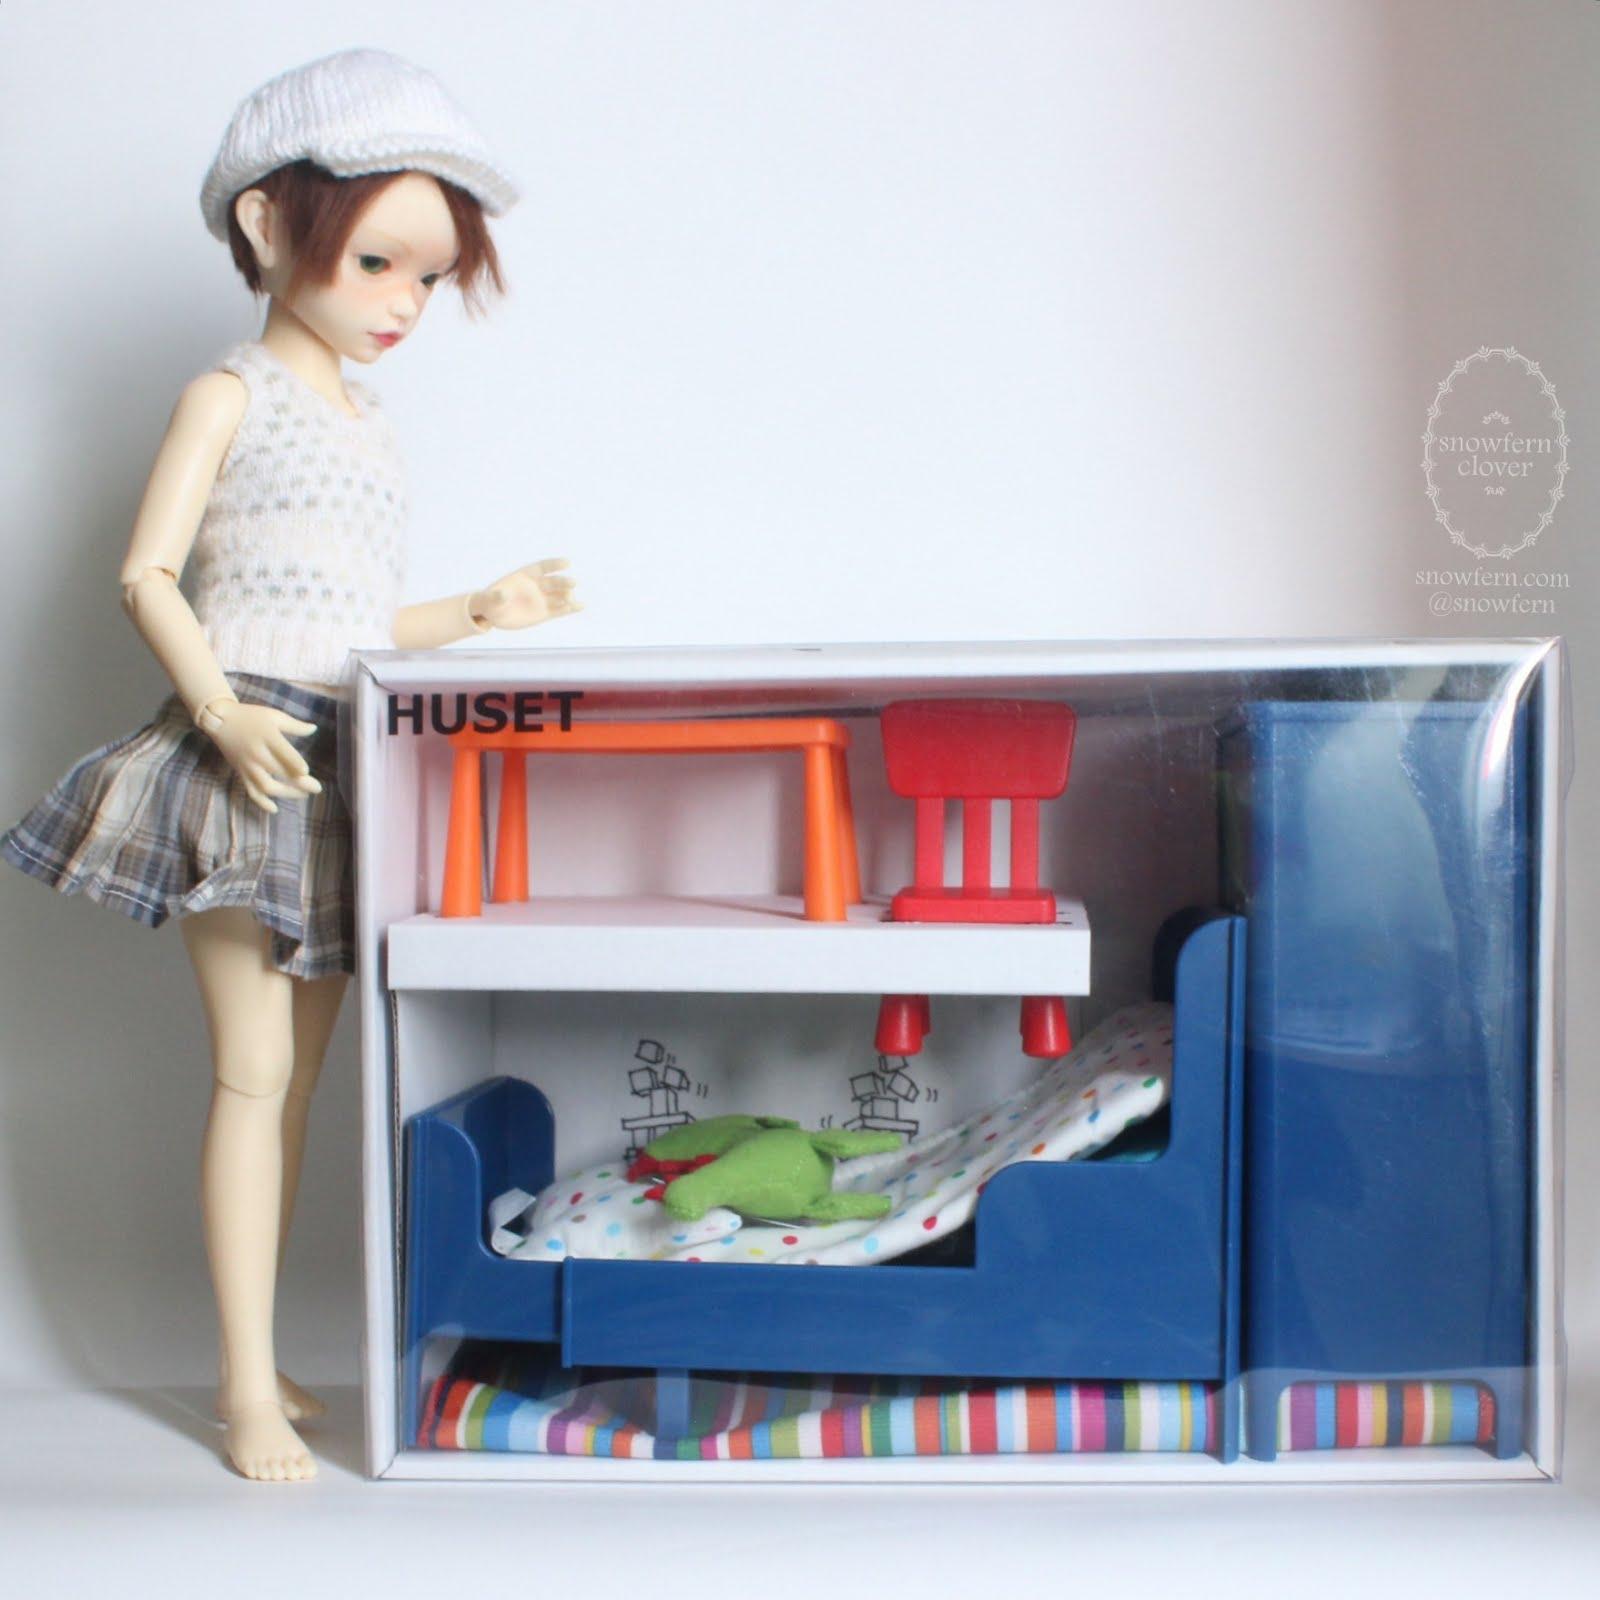 ikea miniature furniture. Miniature IKEA HUSET Bedroom Set Review! Ikea Furniture D